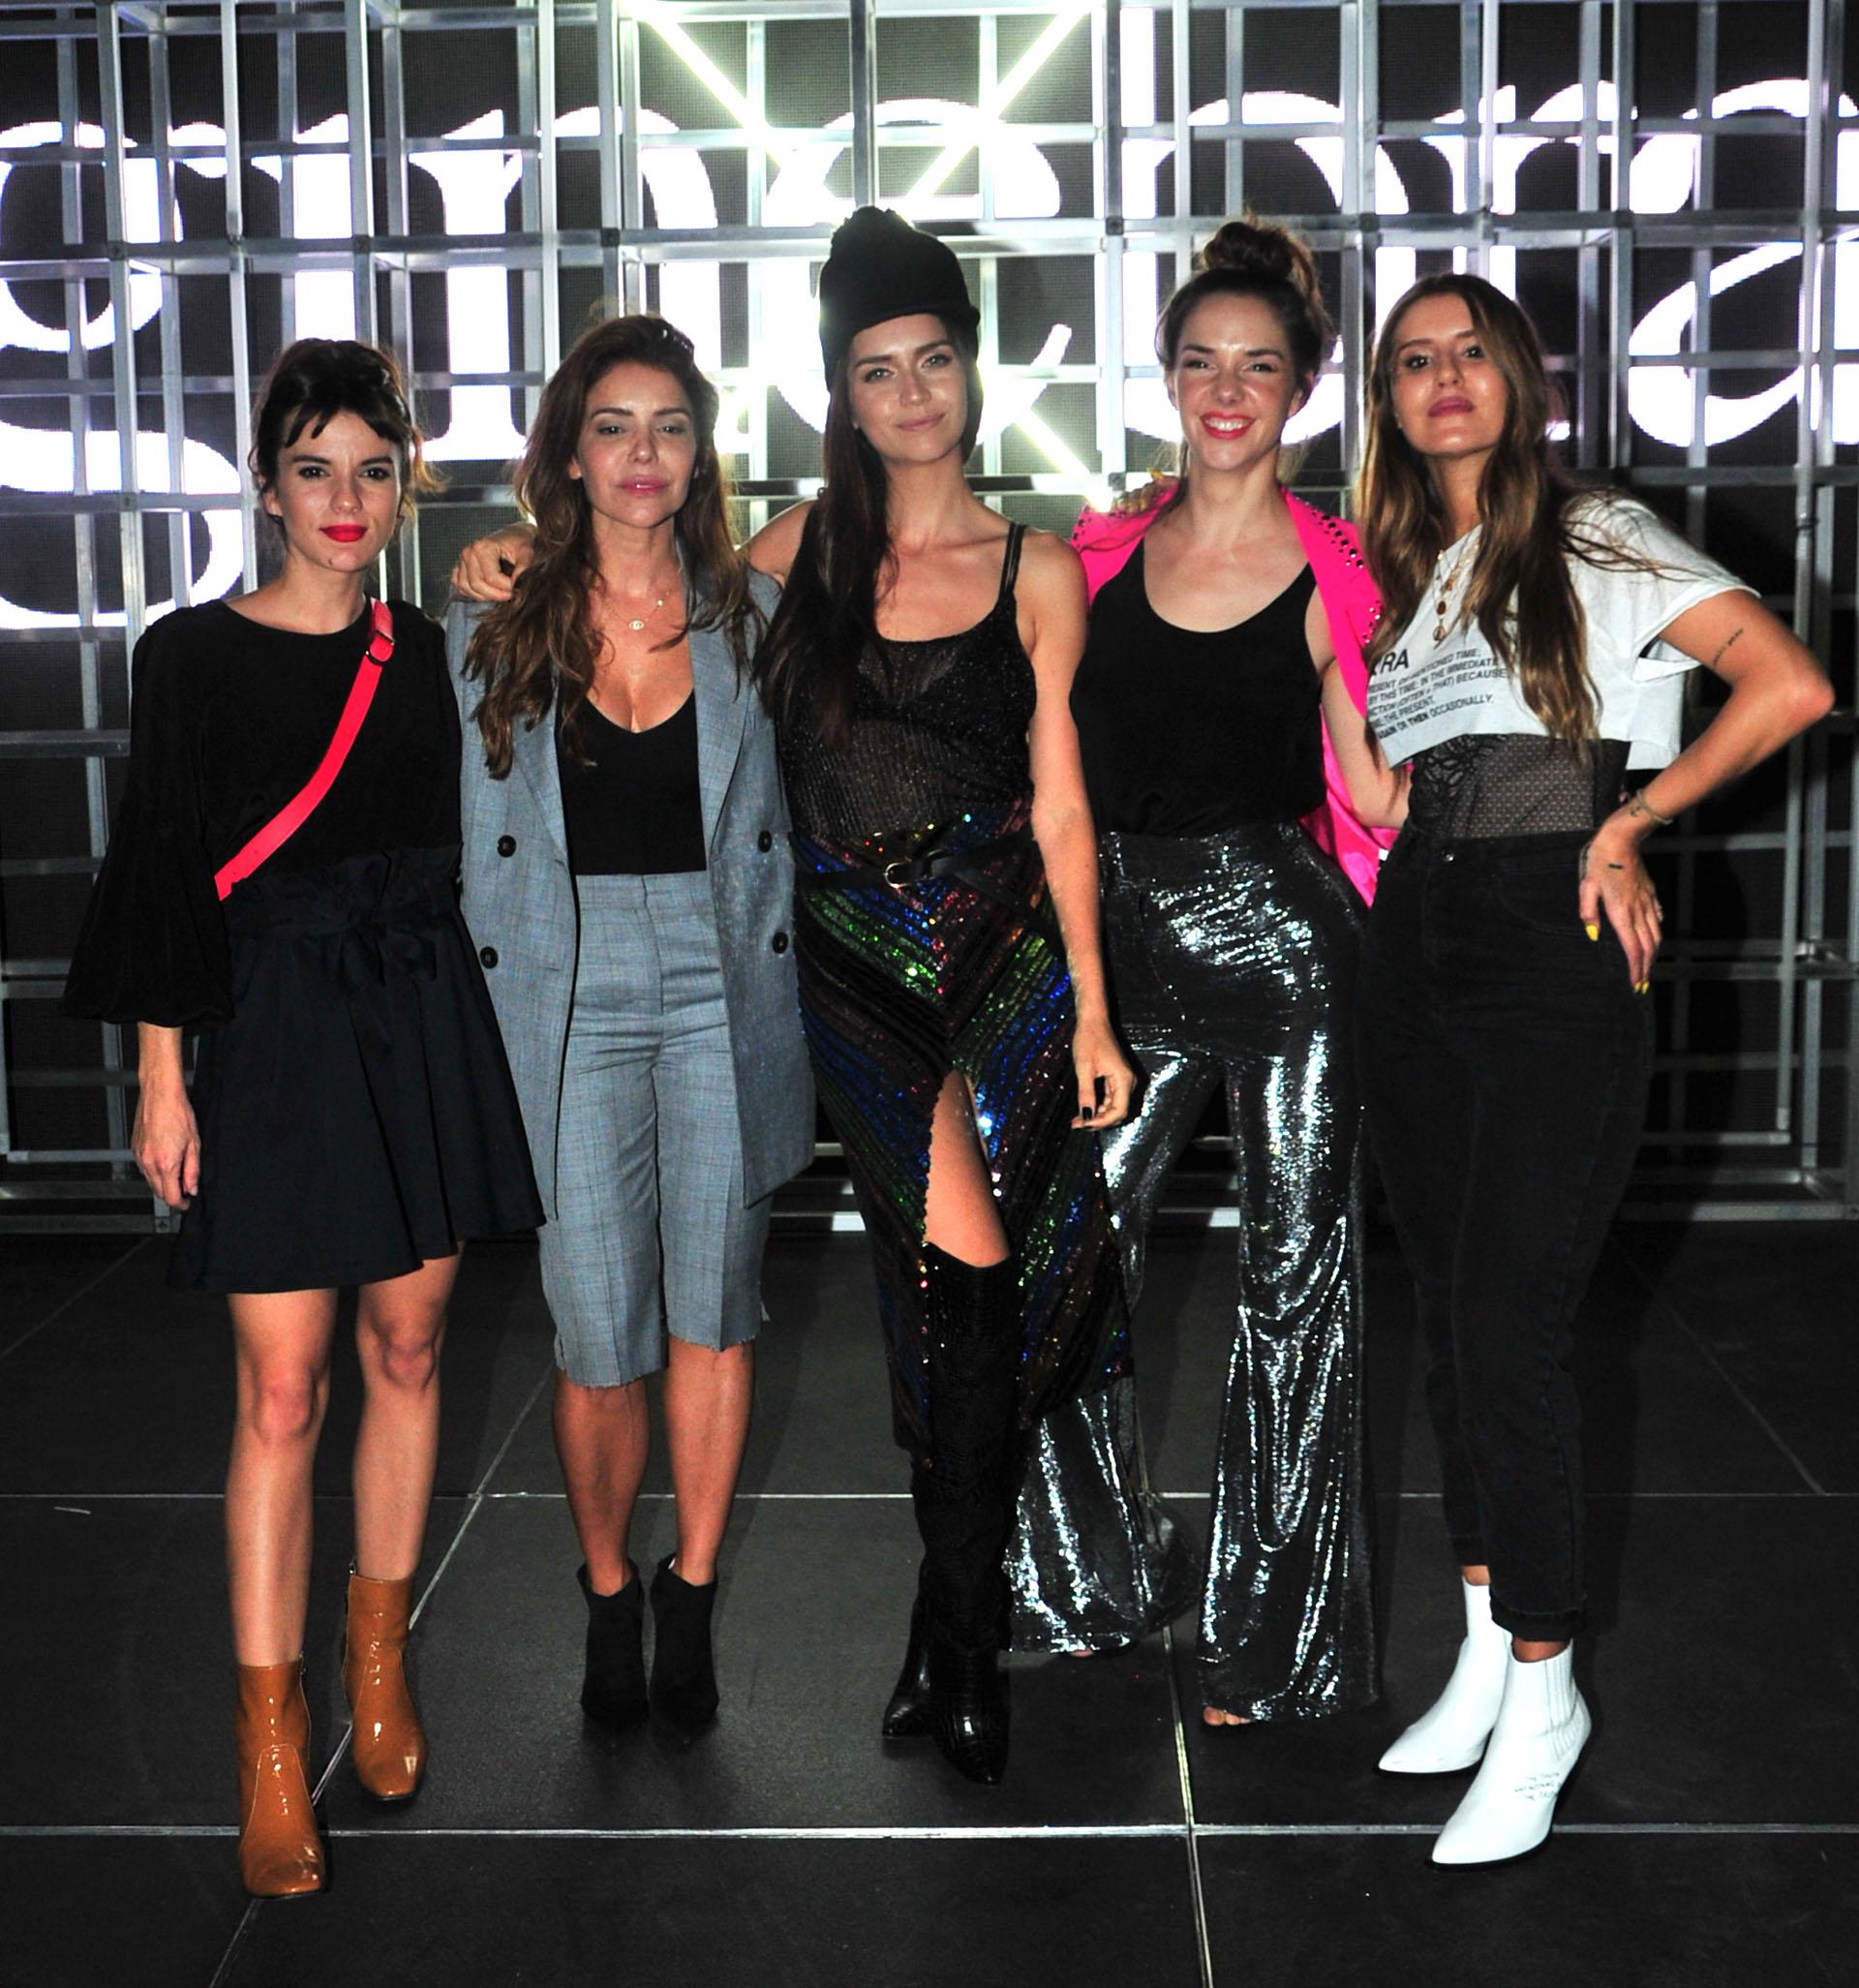 Gimena Accardi, Romina Pigretti, Zaira Nara, Julieta Nair Calvo y Micaela Tinelli